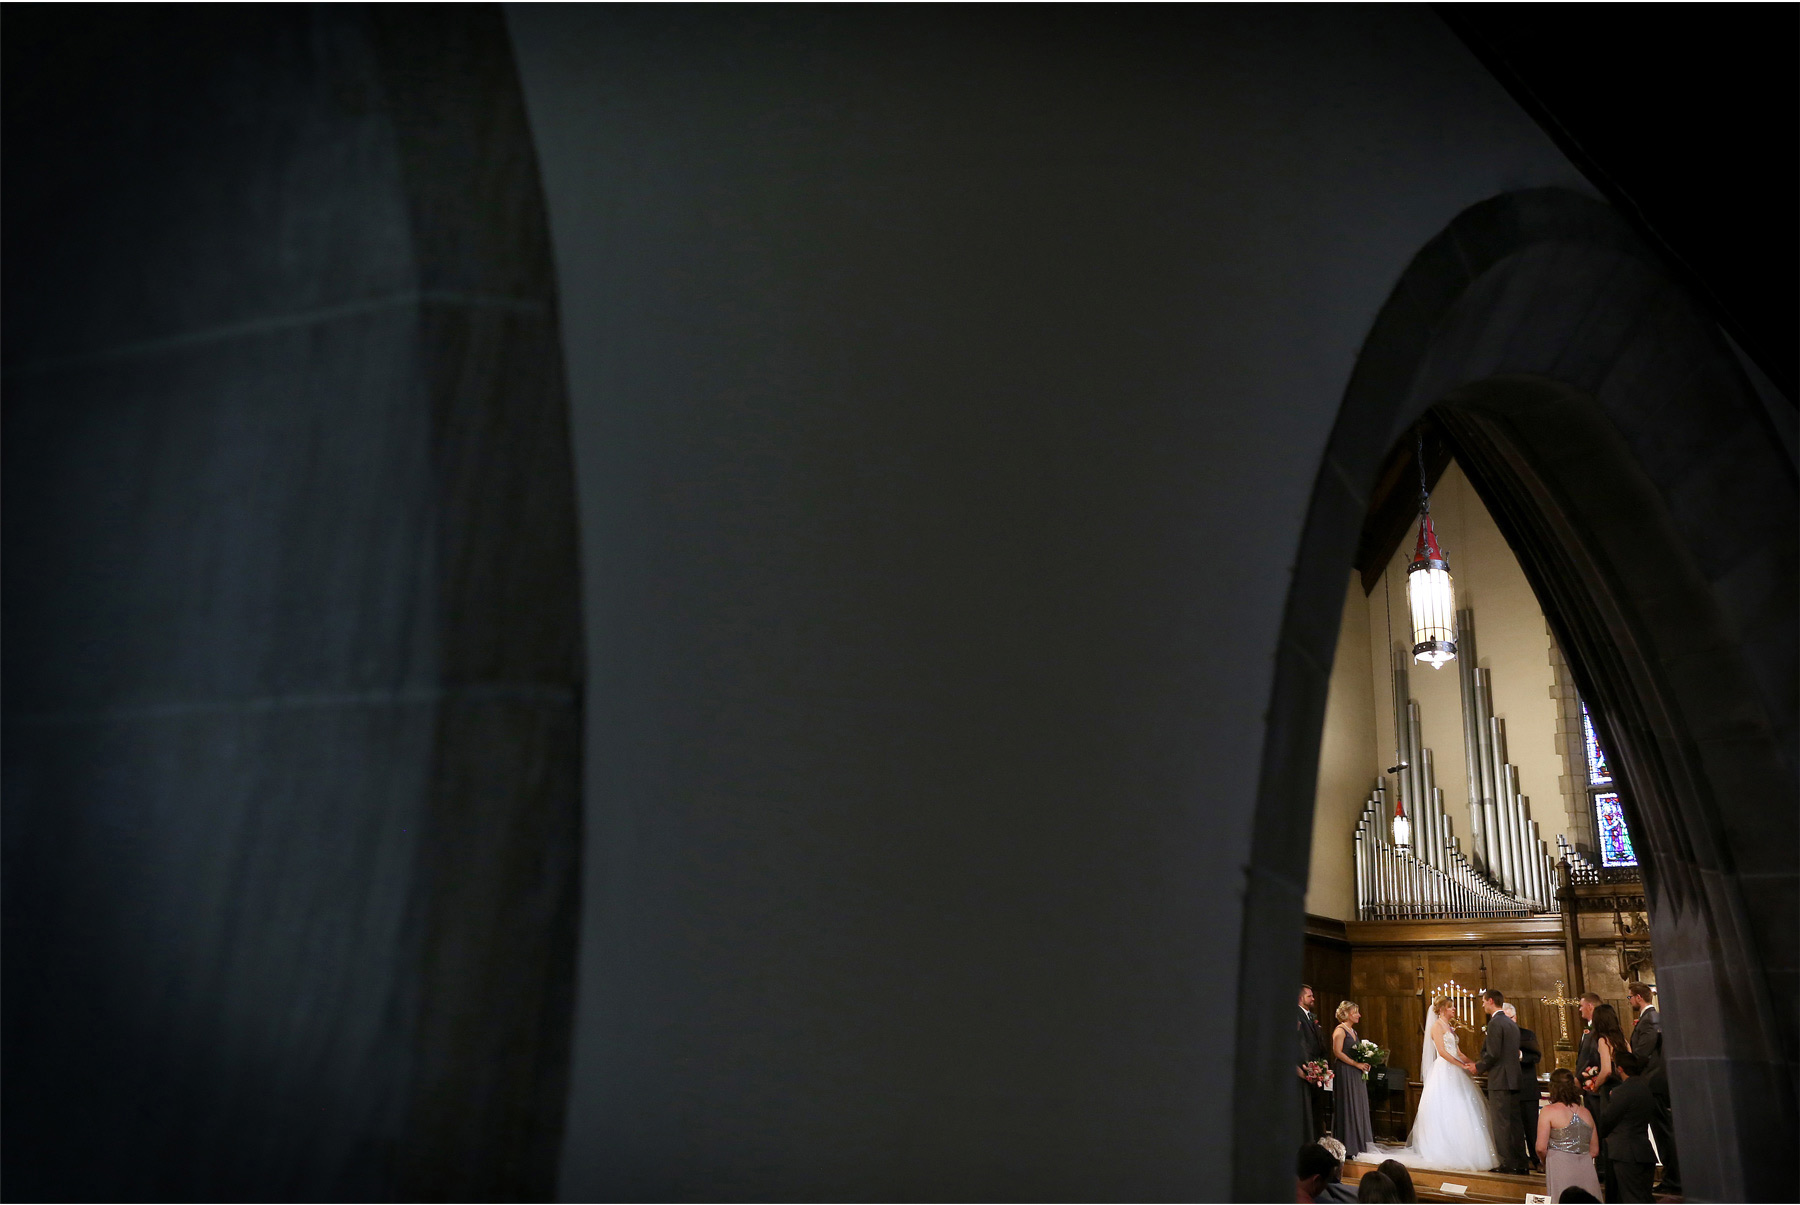 11-Minneapolis-Wedding-Photography-by-Vick-Photography-Hamline-Church-United-Methodist-Ceremony-Kasie-and-Joshua.jpg